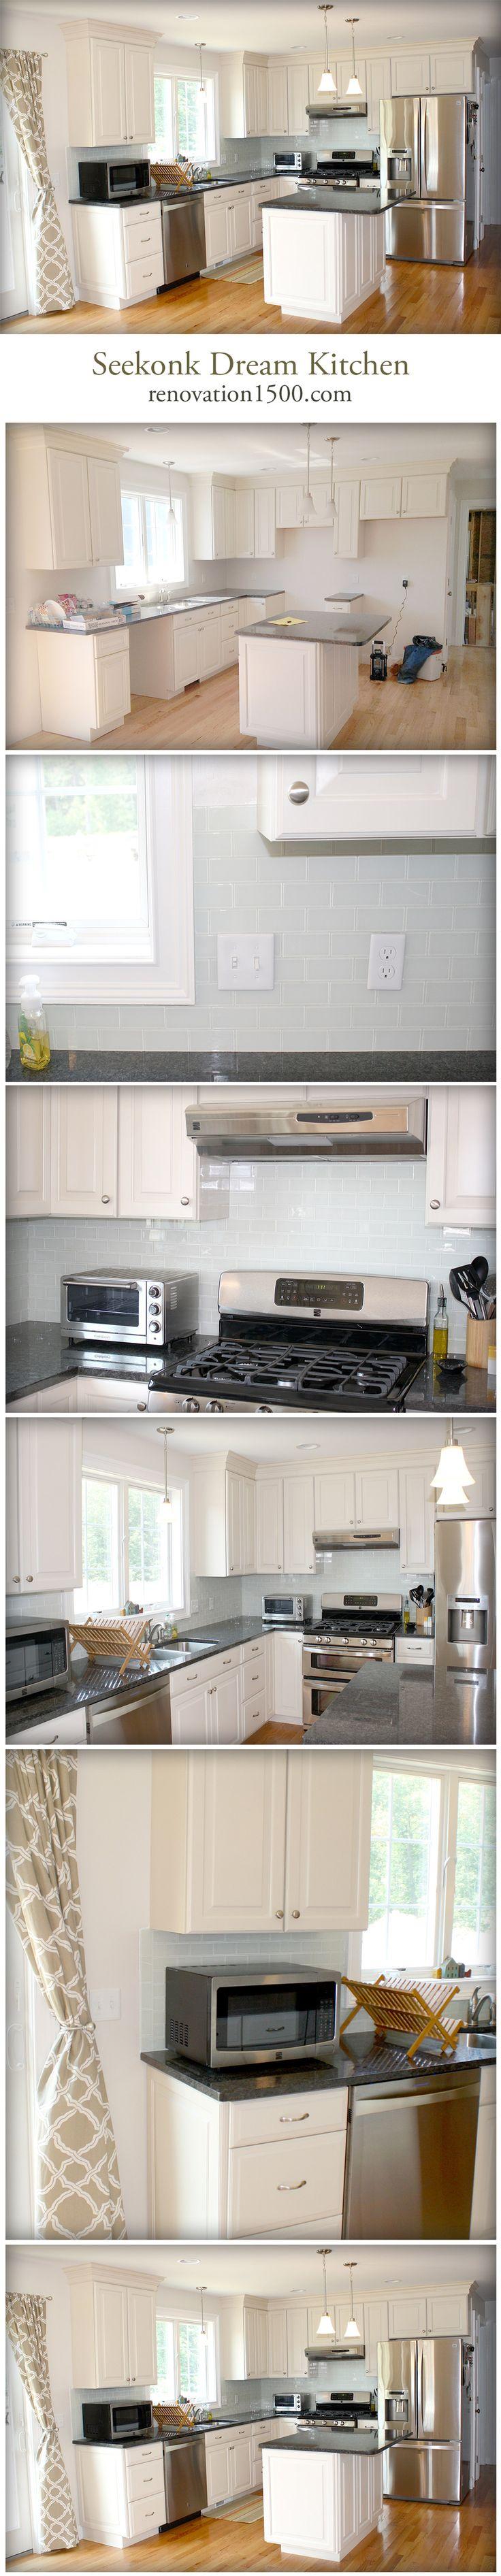 131 best Custom Renovation Projects images on Pinterest   Kitchen ...